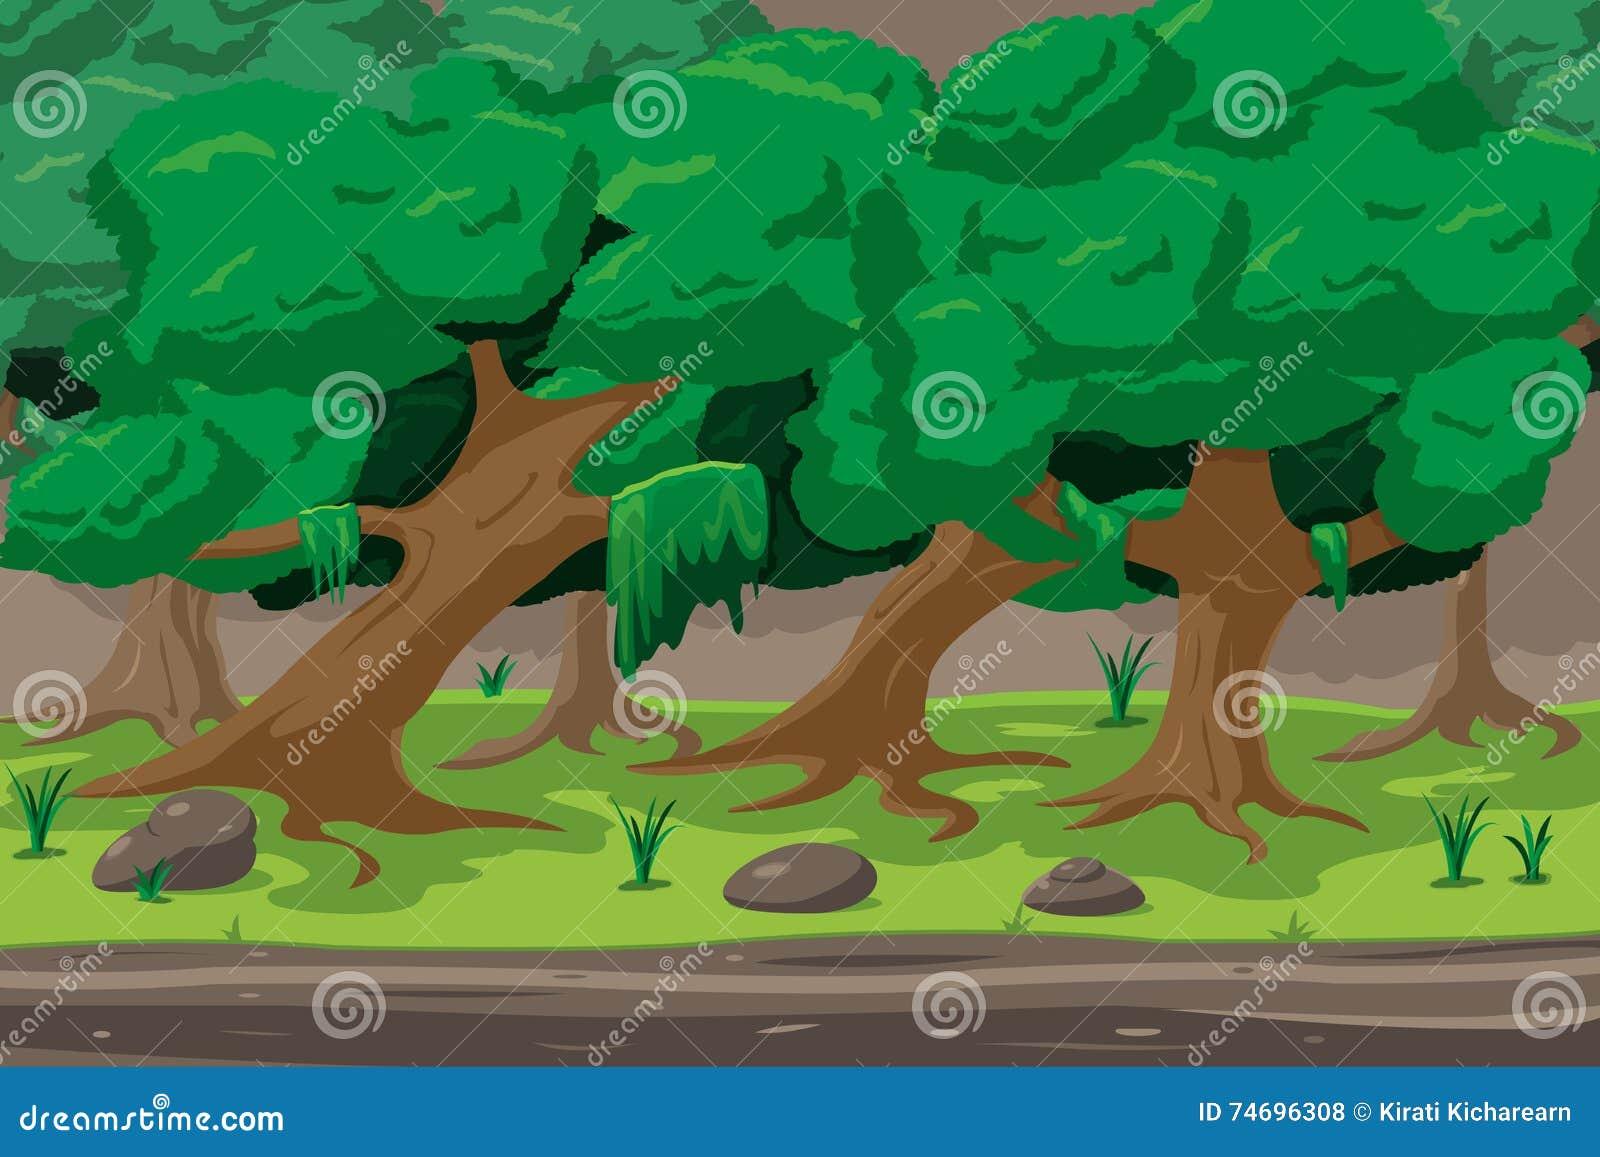 Vetor de Forest Cartoon Outdoor Background Design